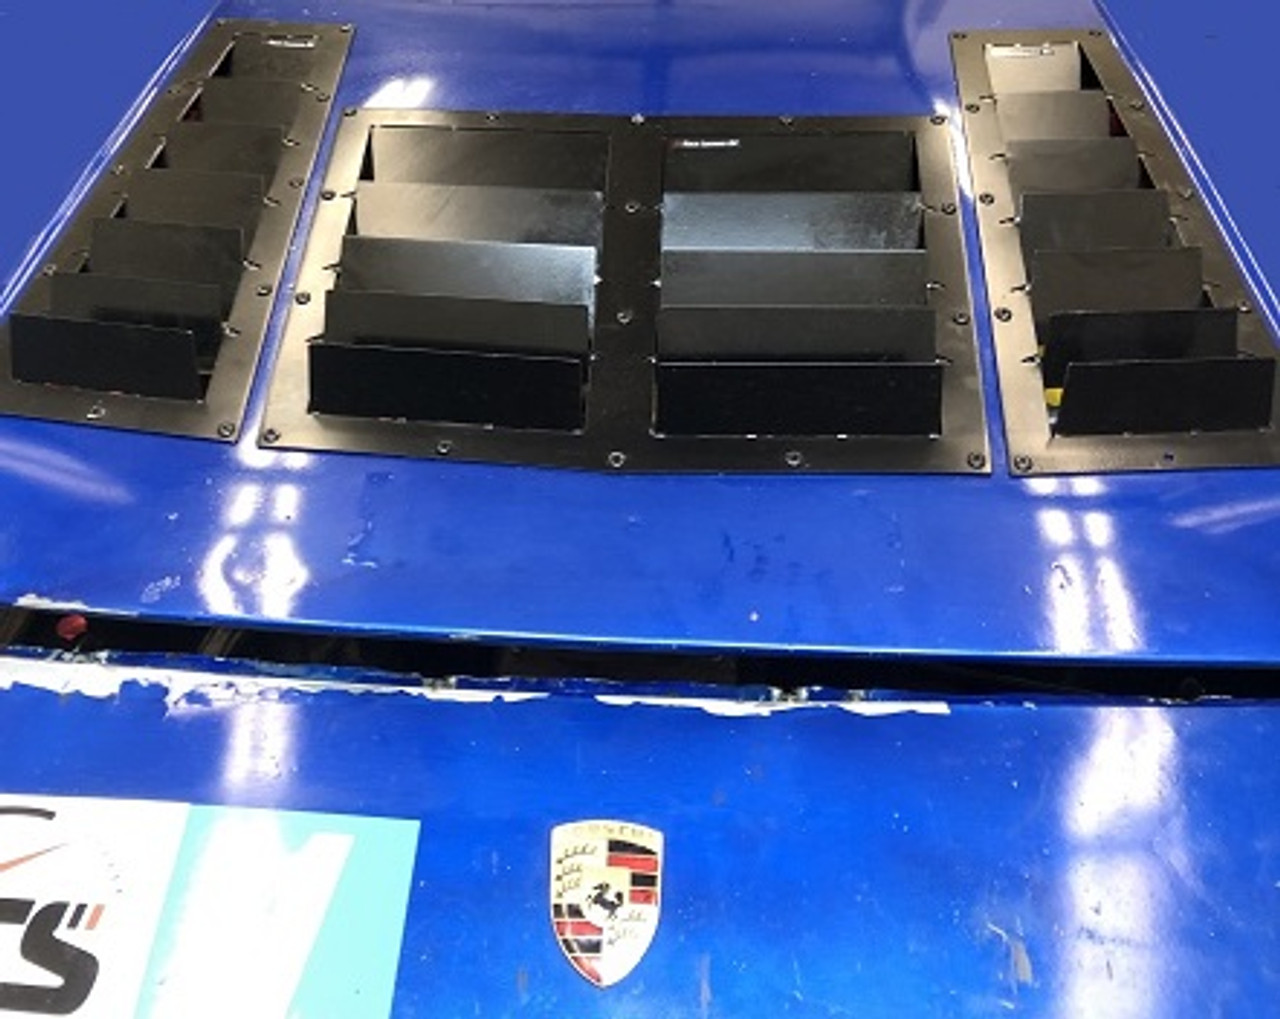 Race Louver Porsche 924/944 RS street trim center car hood vent designed for street, high performance driving and light track duty.